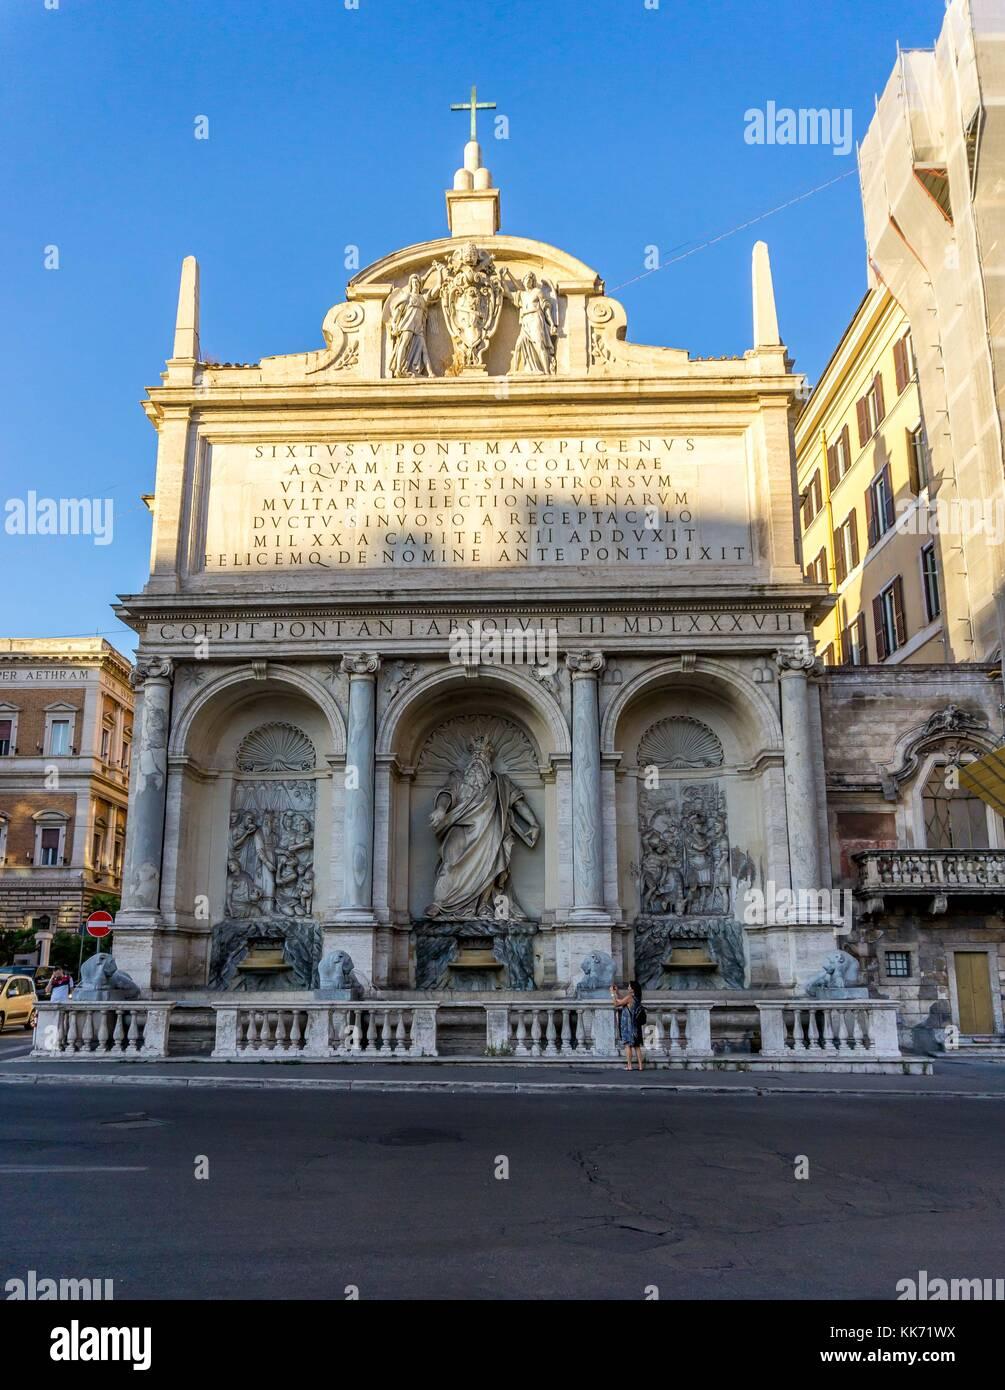 Fontana dell Acqua Felice,( the fountain of moses),Piazza di S. Bernardo, 00185 Roma RM, Italy - Stock Image